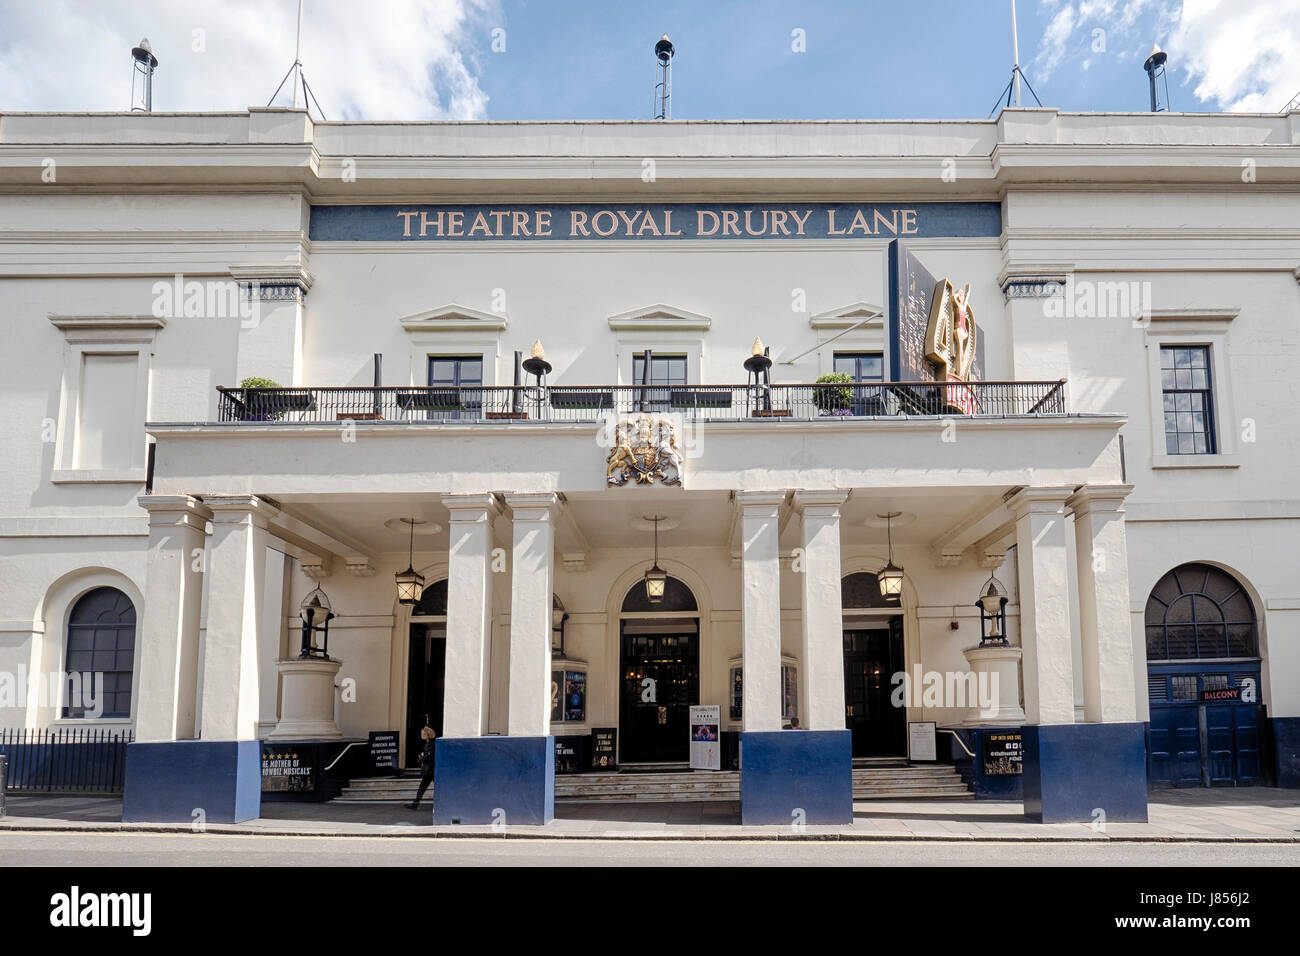 Theatre Royal Drury Lane in Covent Garden London - Stock Image